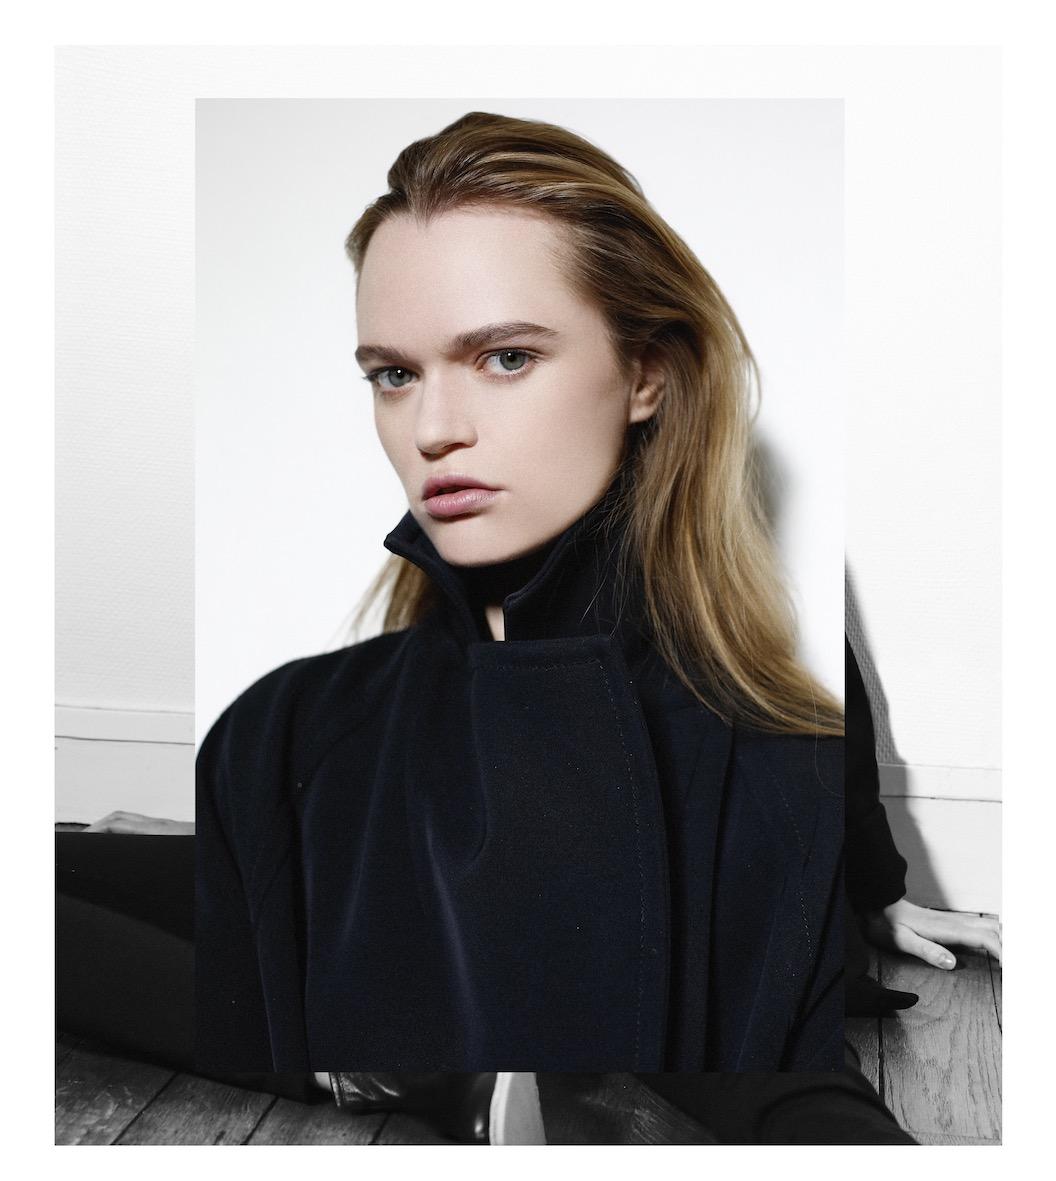 Balistarz-model-Olga-Zinovyeva-portrait-shoot-mixed-in-like-a-illusion